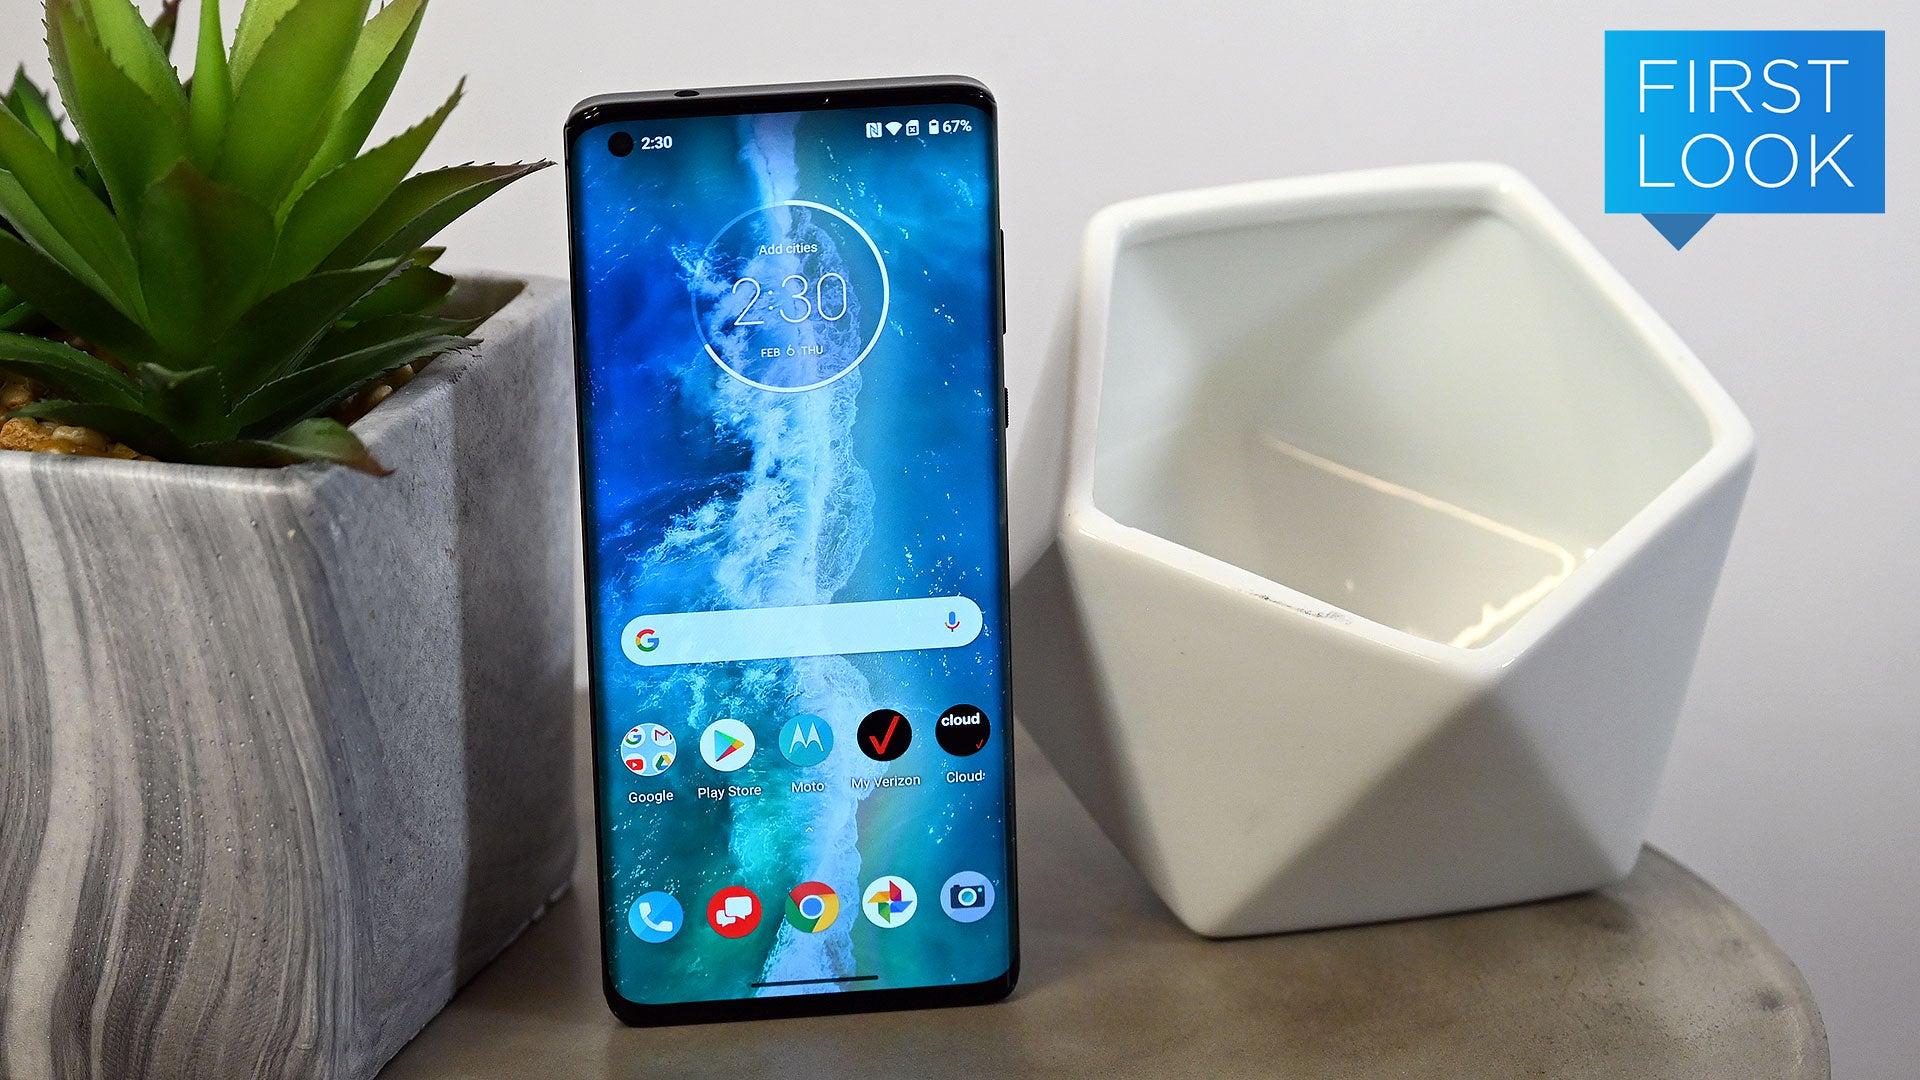 Motorola Edge+: Endless Edge Screen And A Goddamn Headphone Jack For Less Than Samsung's Best